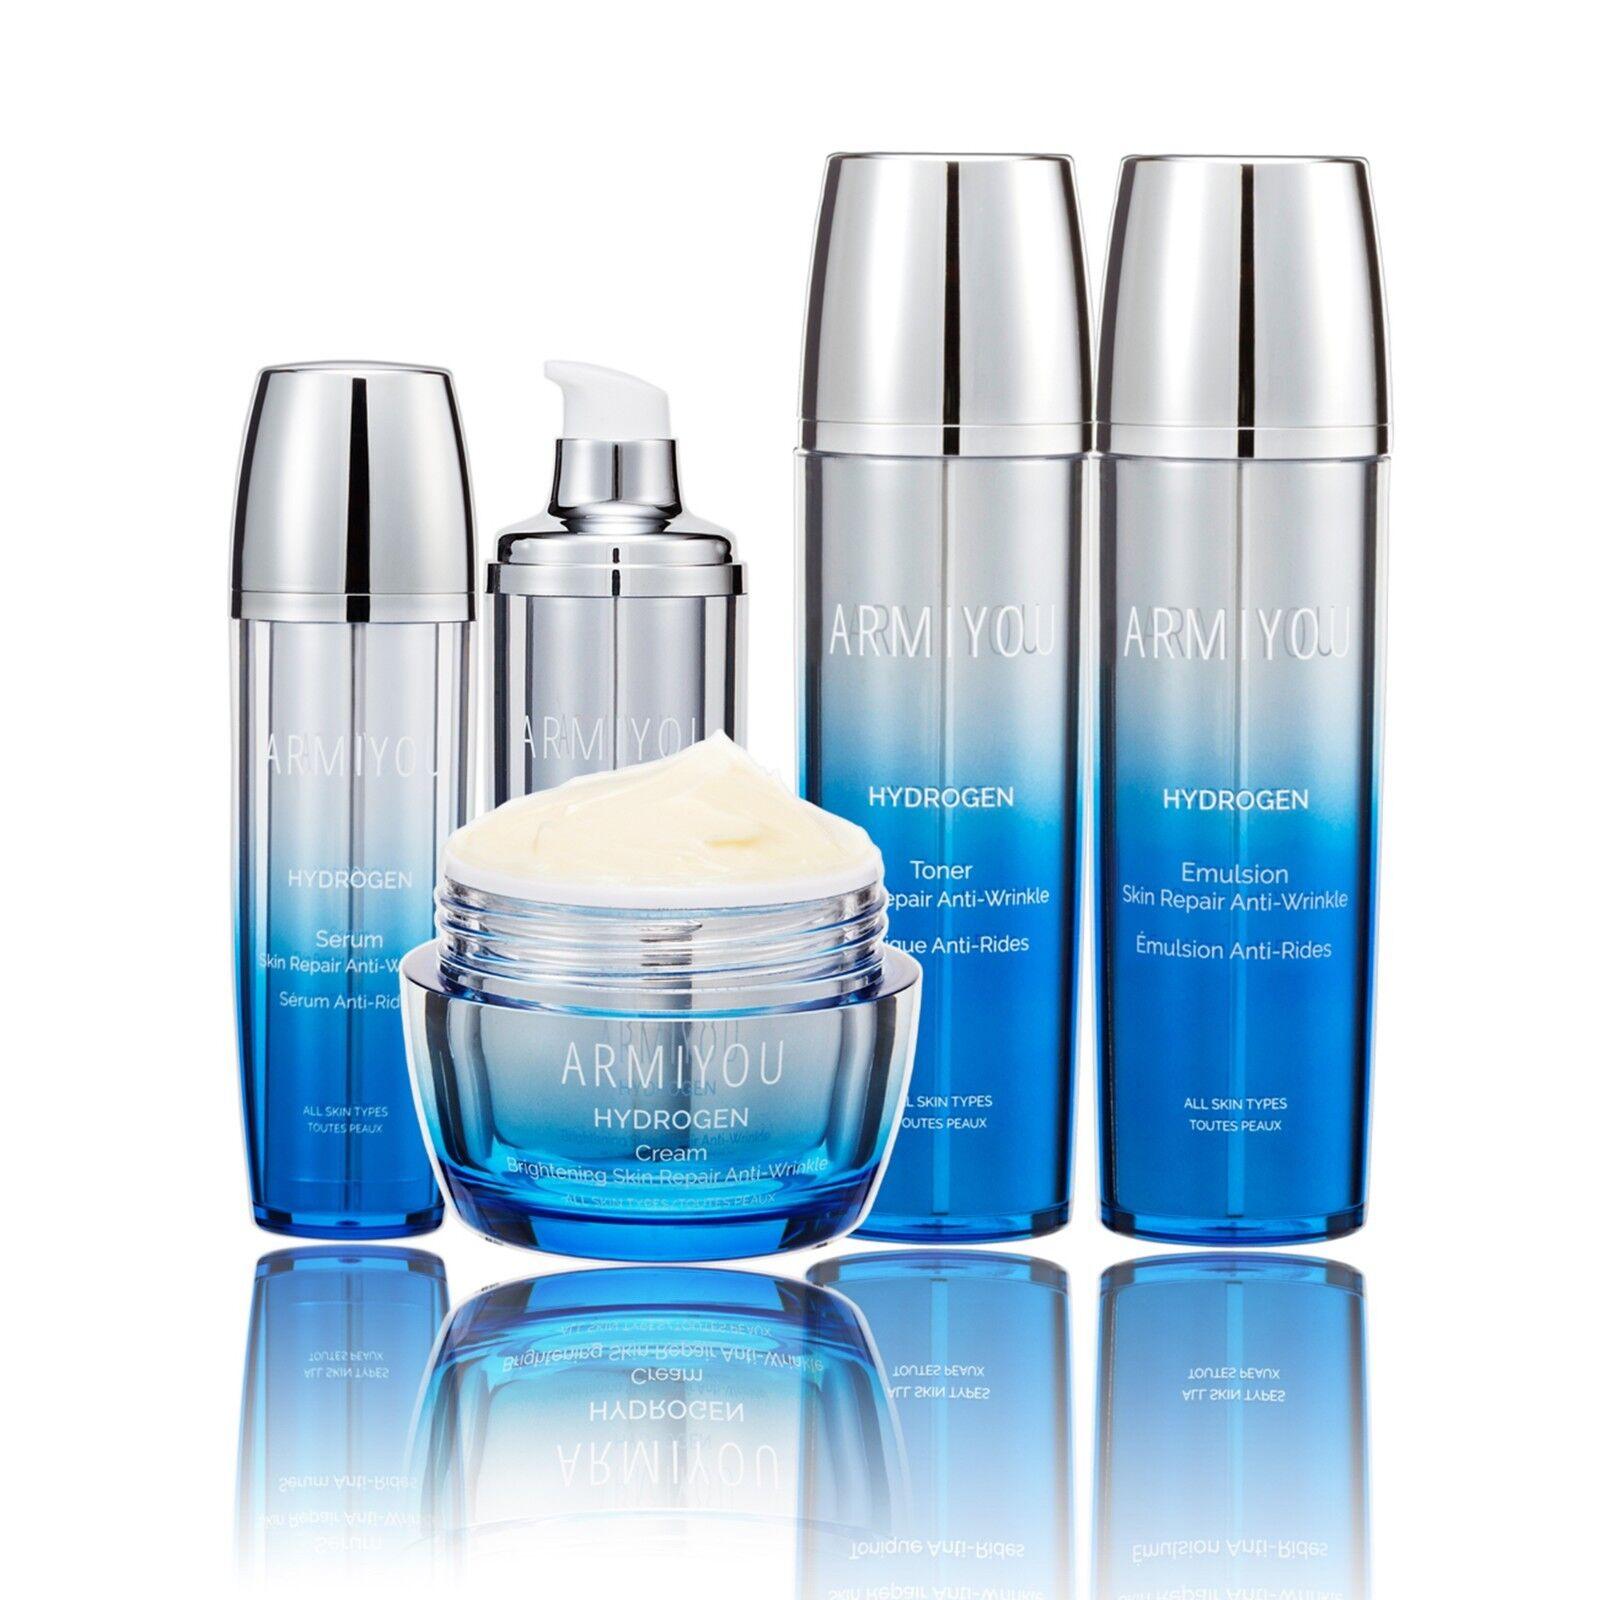 Armiyou K-BEAUTY Skin Care HYDROGEN Face Repair Anti-Wrinkle Anti-Aging Set